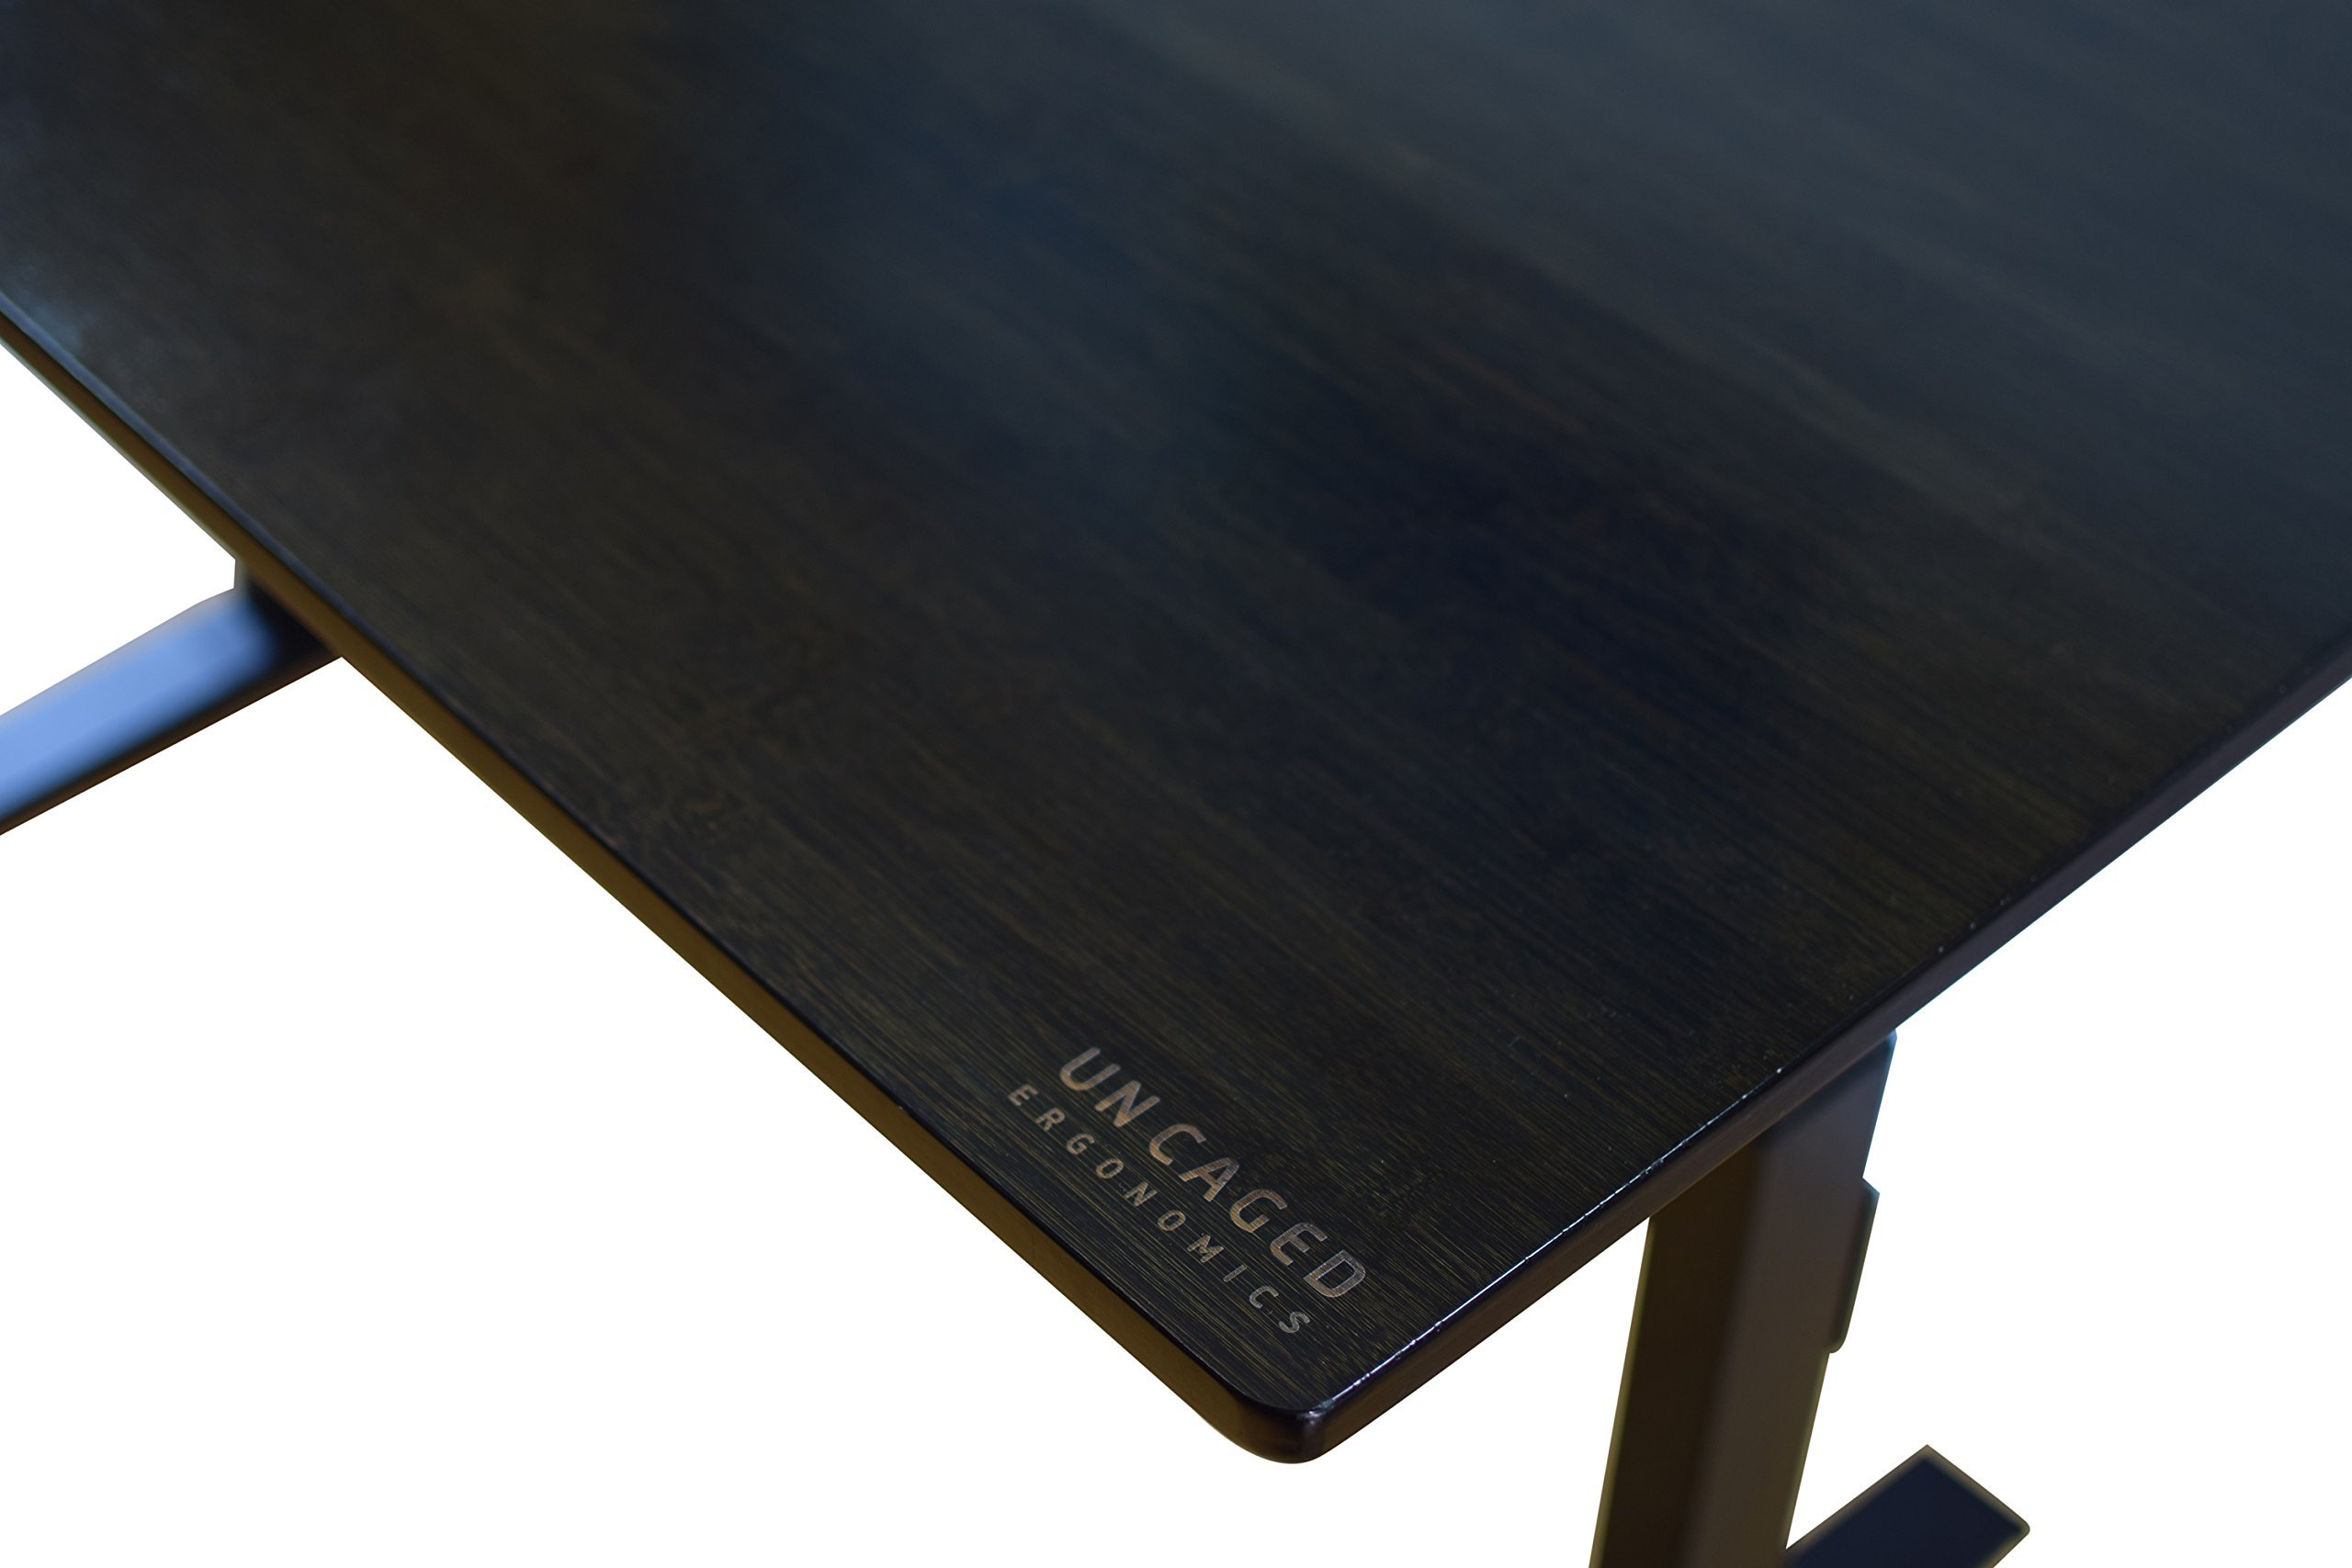 RISE UP Electric Adjustable Height Standing Desk + Beautiful Black Bamboo Desktop| Memory Keypad| 2 Motors| Affordable Ergonomic Sit Stand Office Desk by Uncaged Ergonomics (Image #8)